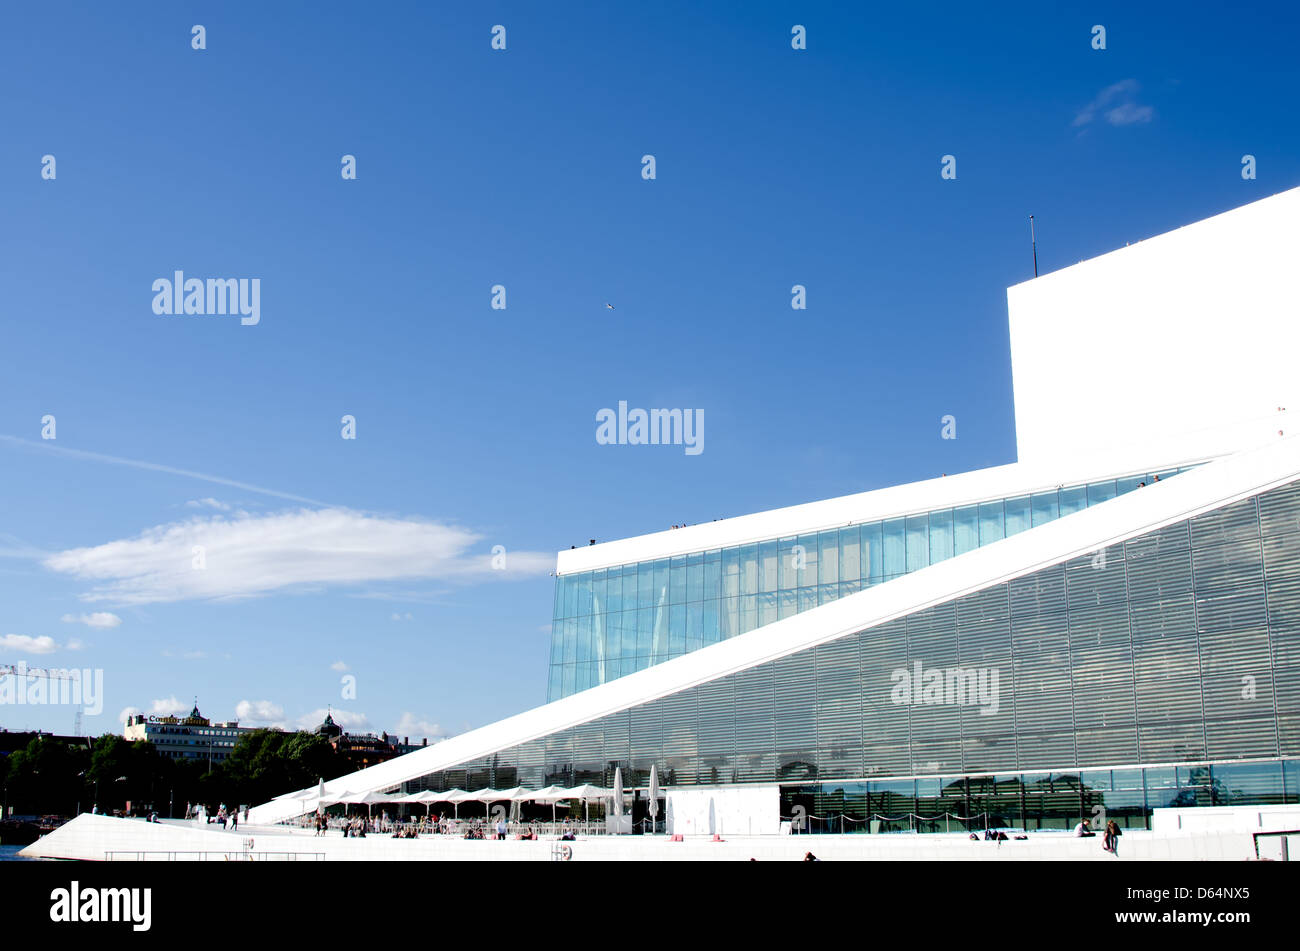 Oslo Opera fjord view - Stock Image